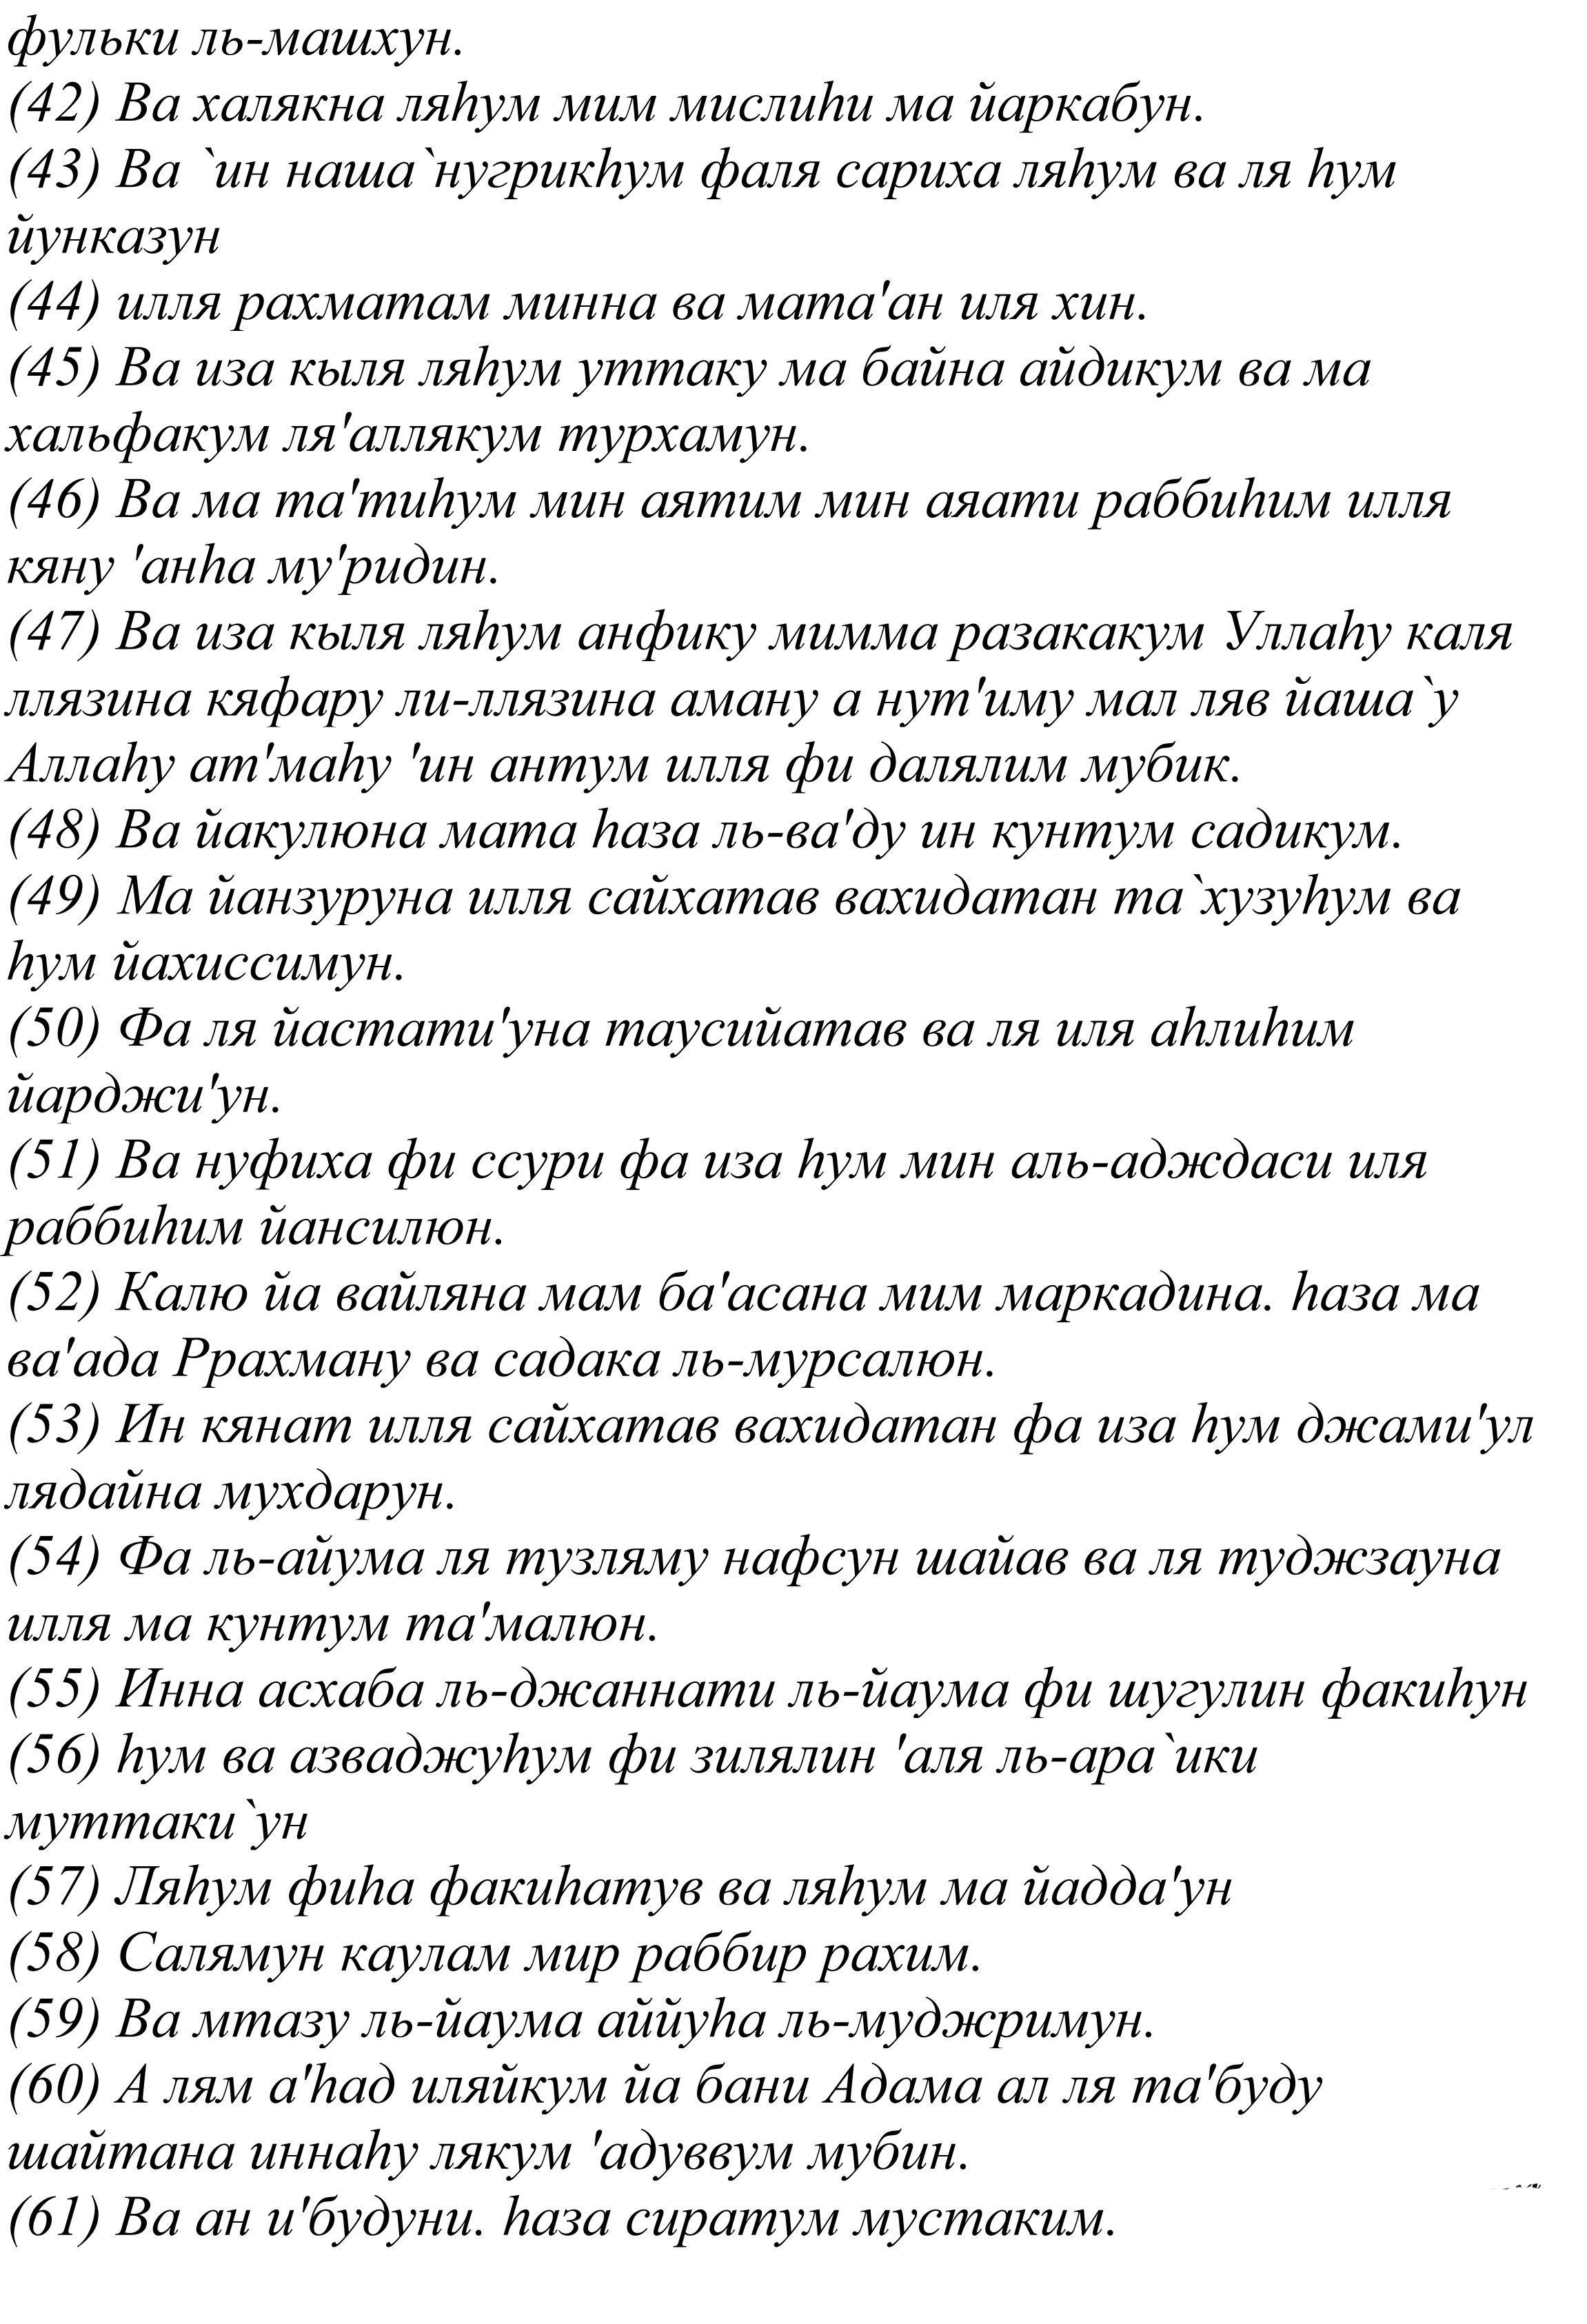 Yasin Chitat Na Russkom Tekst Words Word Search Puzzle